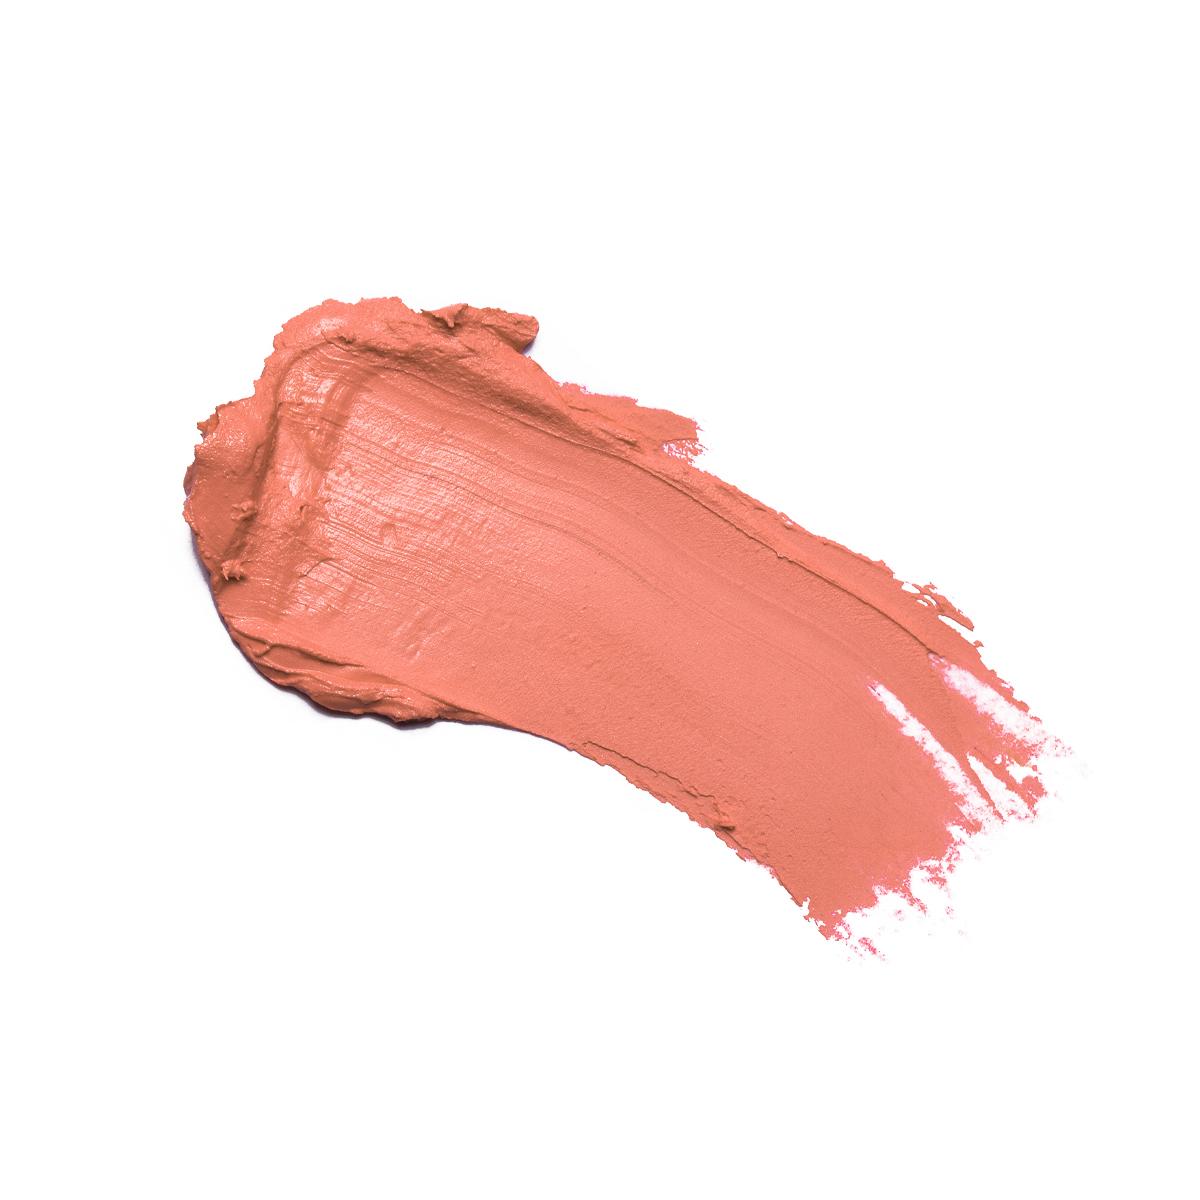 Lipstick - 01